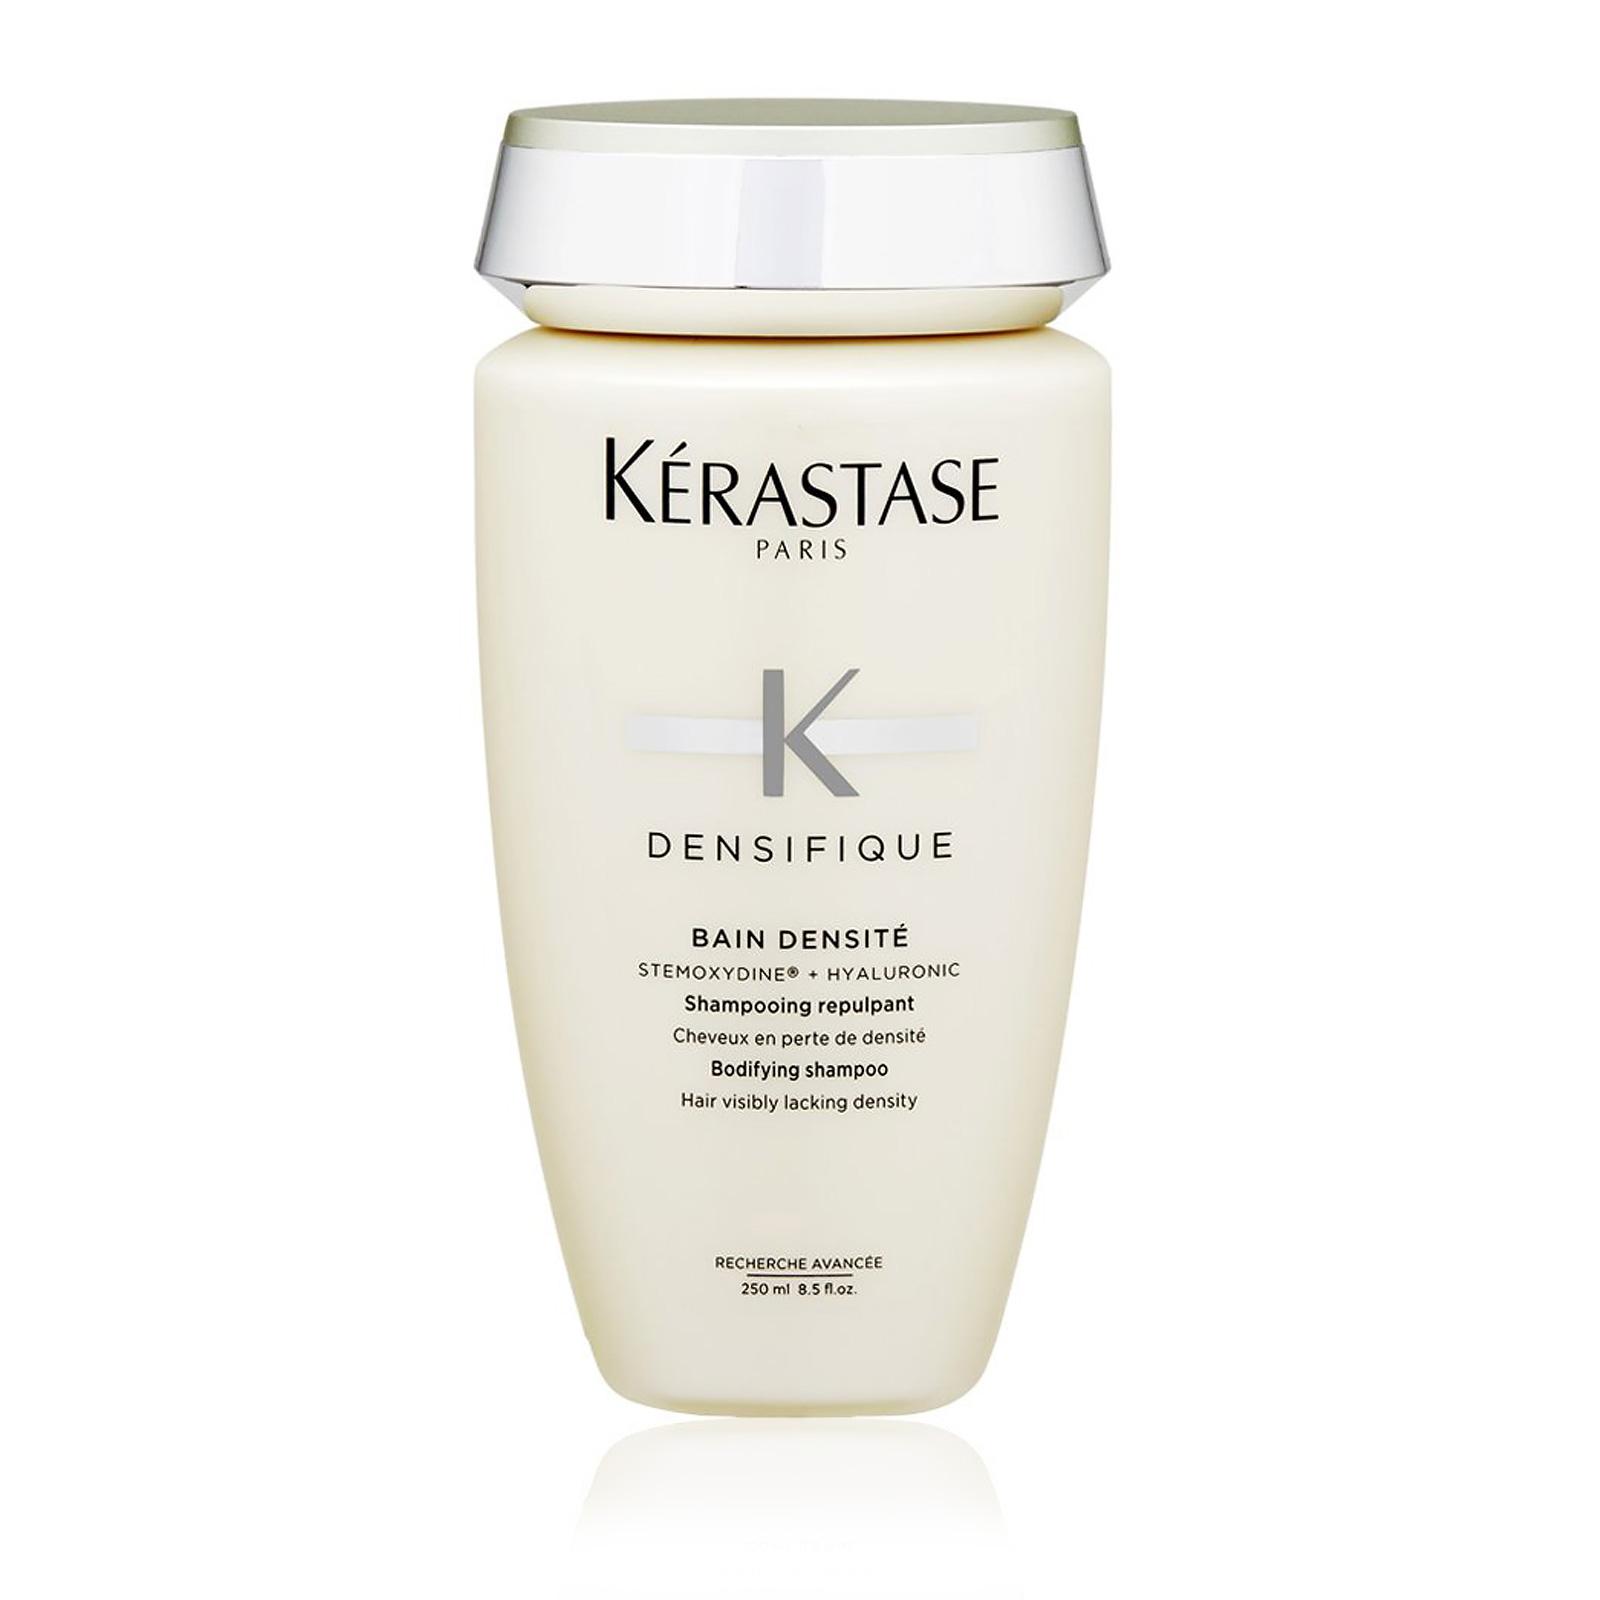 Densifique Bain Densite Bodifying Shampoo (For Hair Visibly Lacking Density)